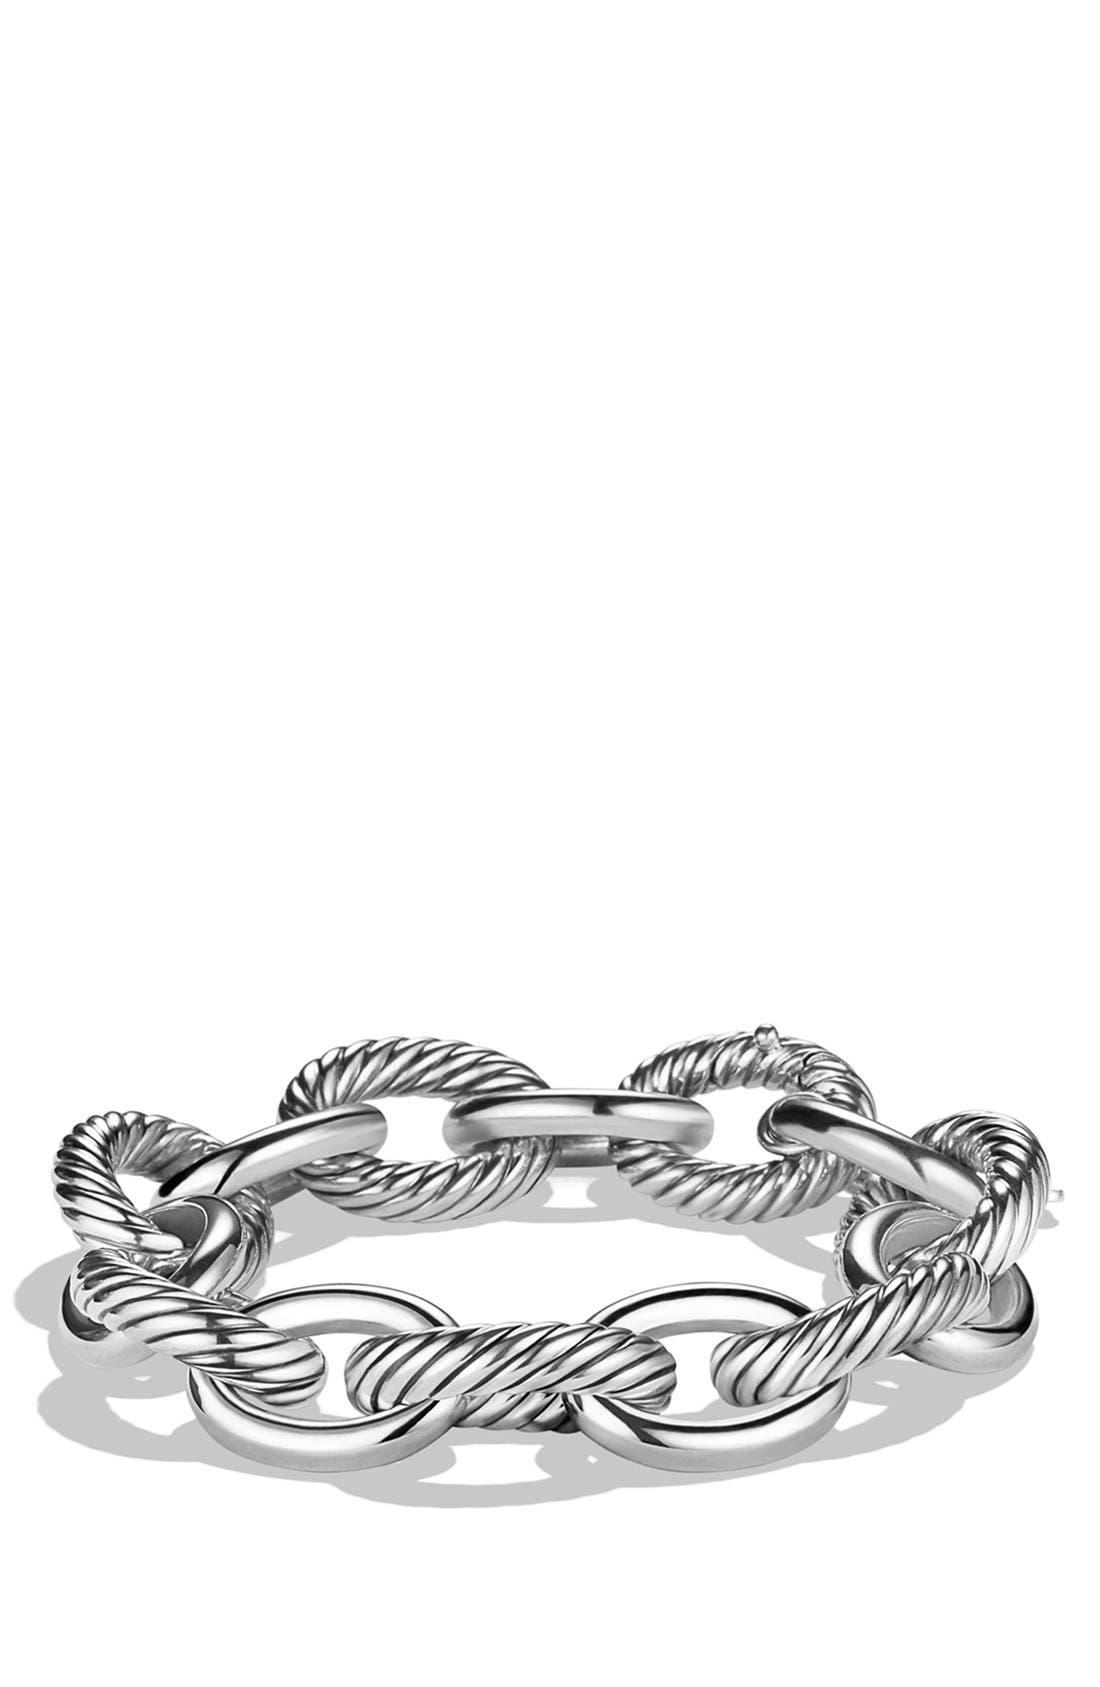 david yurman extra large link bracelet